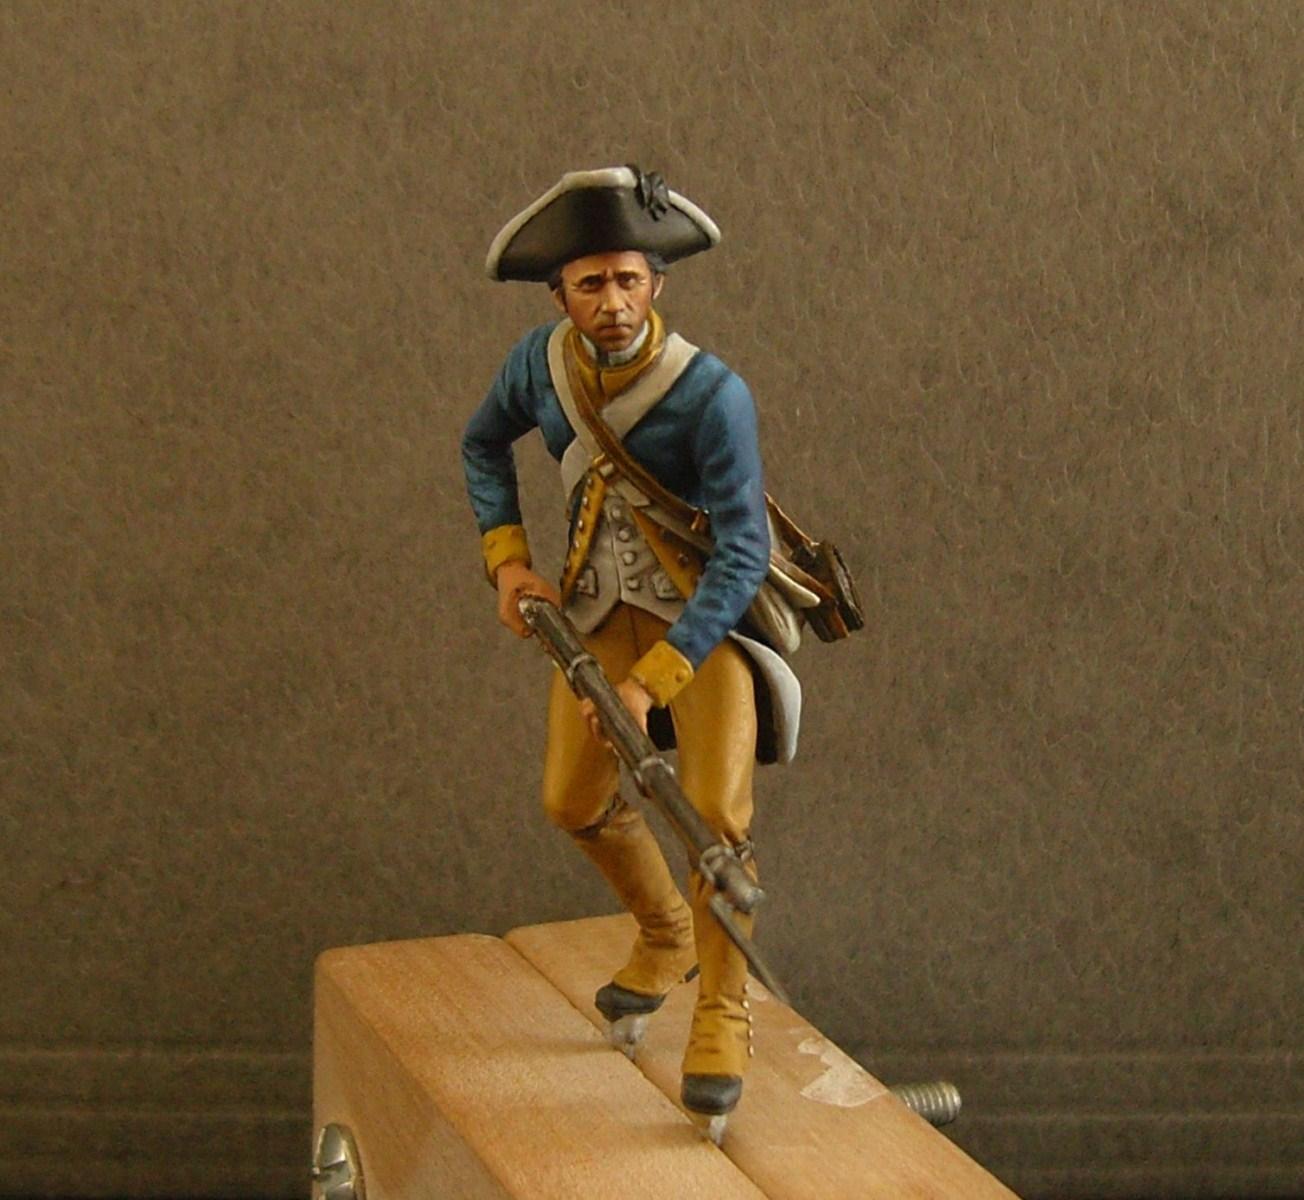 US Revolutionary Infantryman, 1780 - Page 7 120226033337699799494551